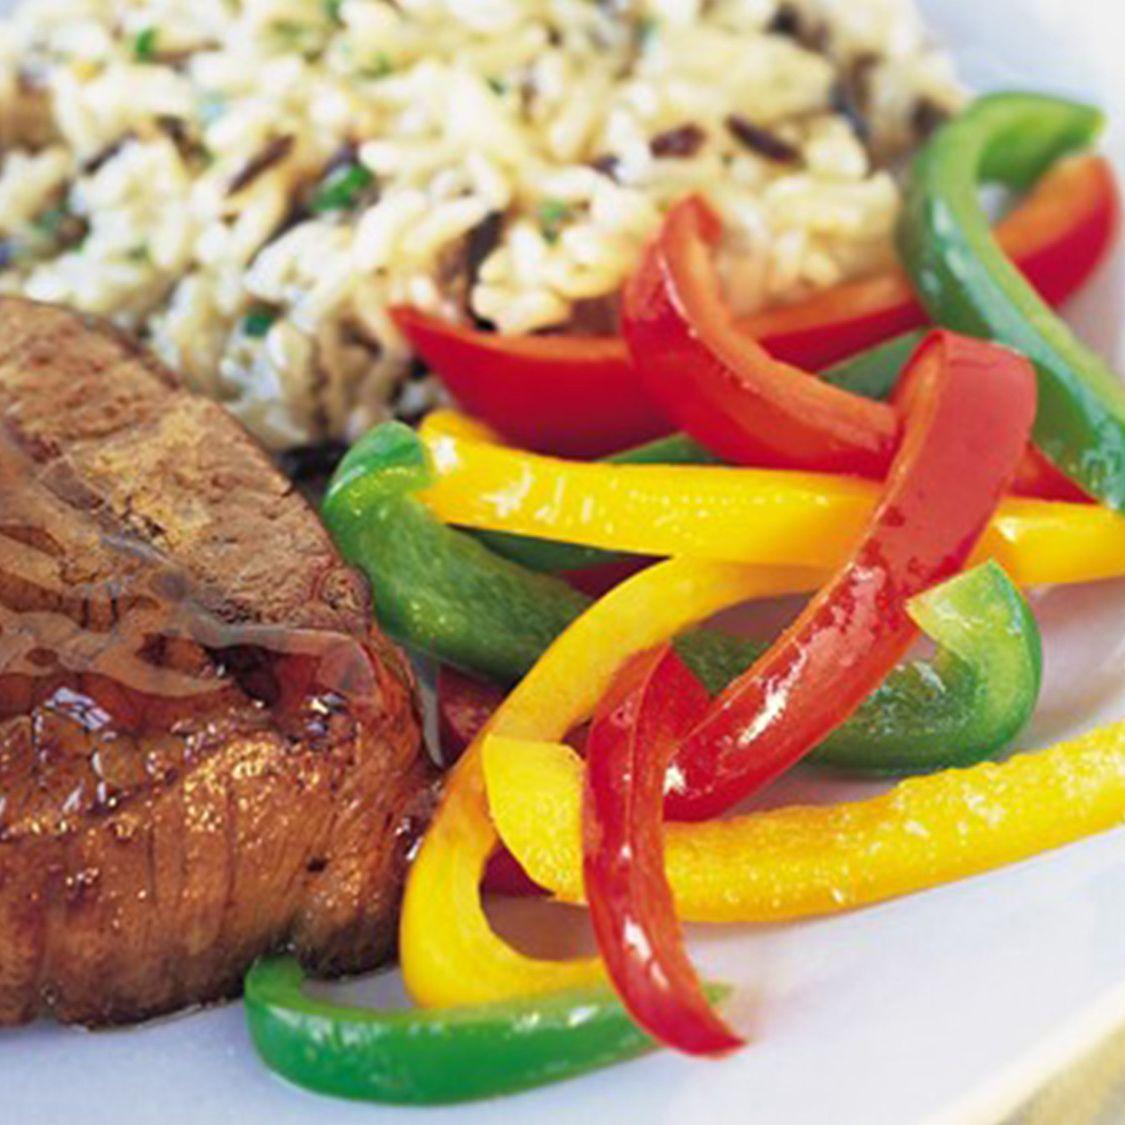 grilled_beef_steaks_with_espressobourbon_sauce.jpg